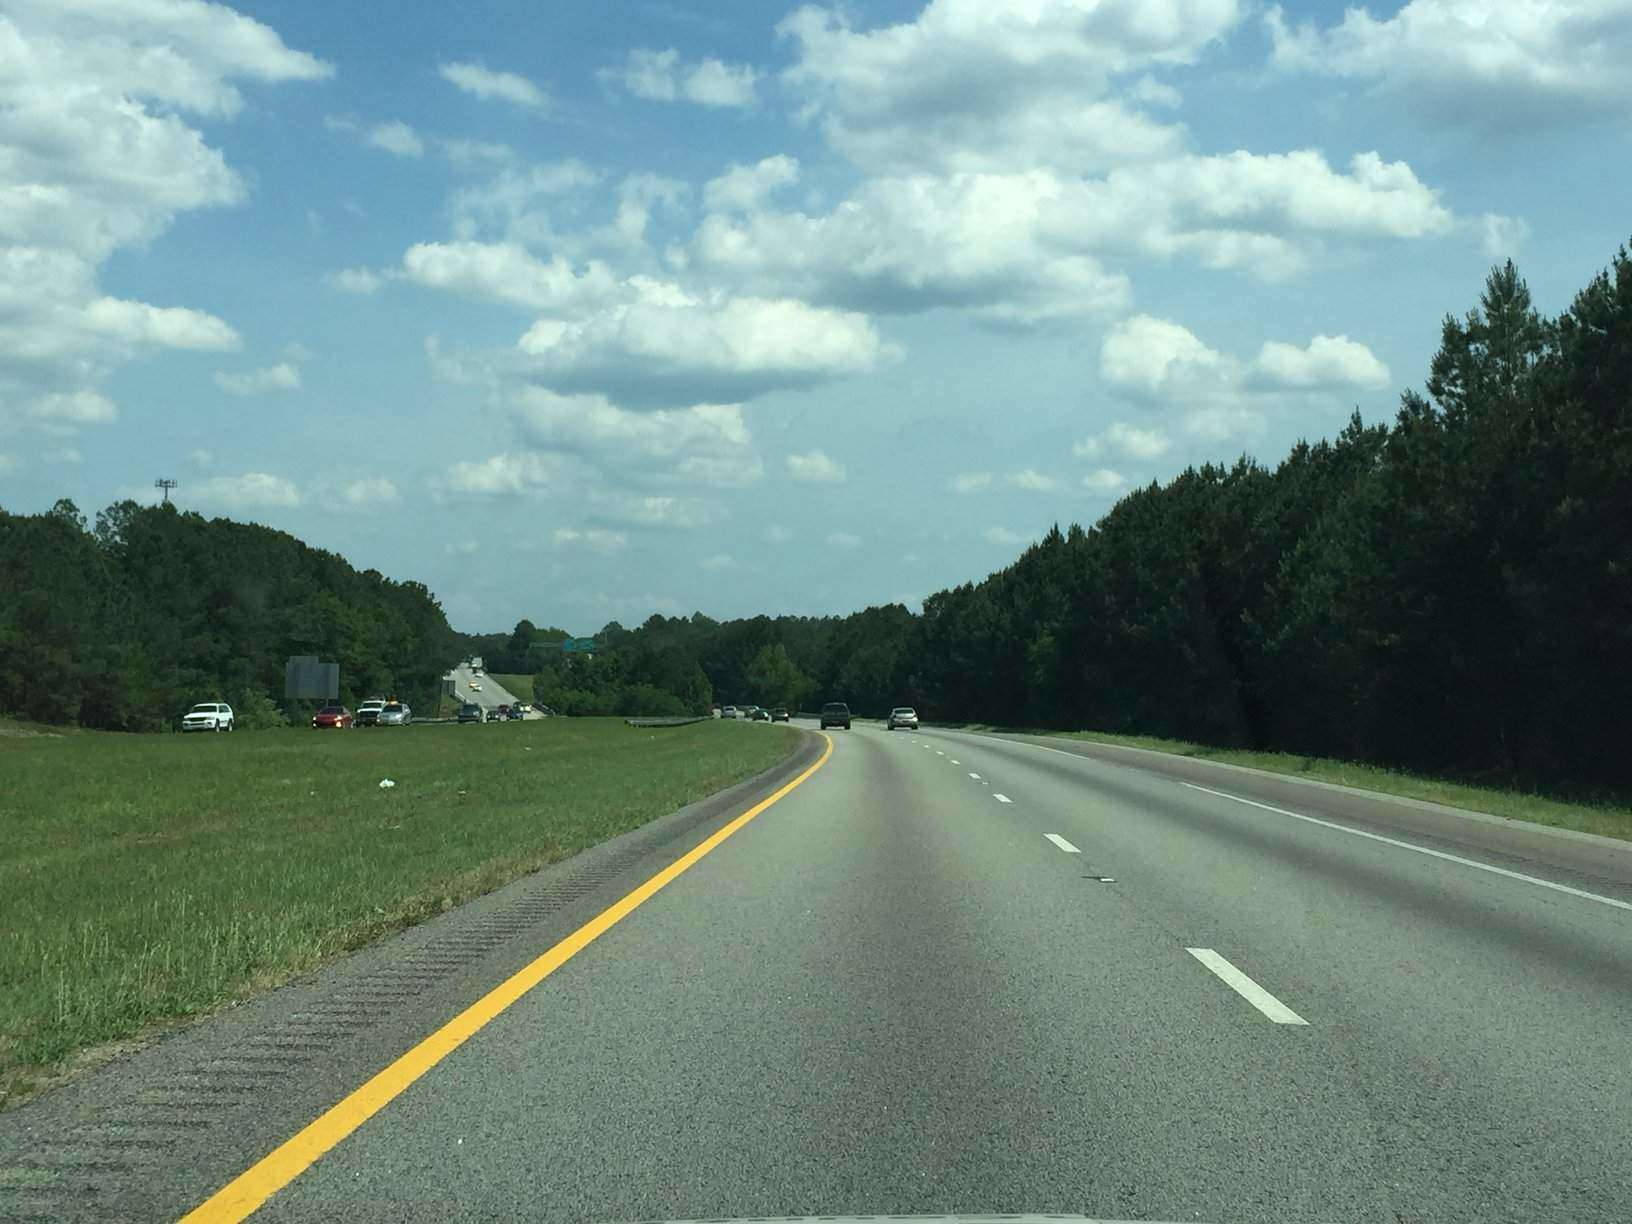 rsz_left_lane_on_interstate_from_inside_car_177377